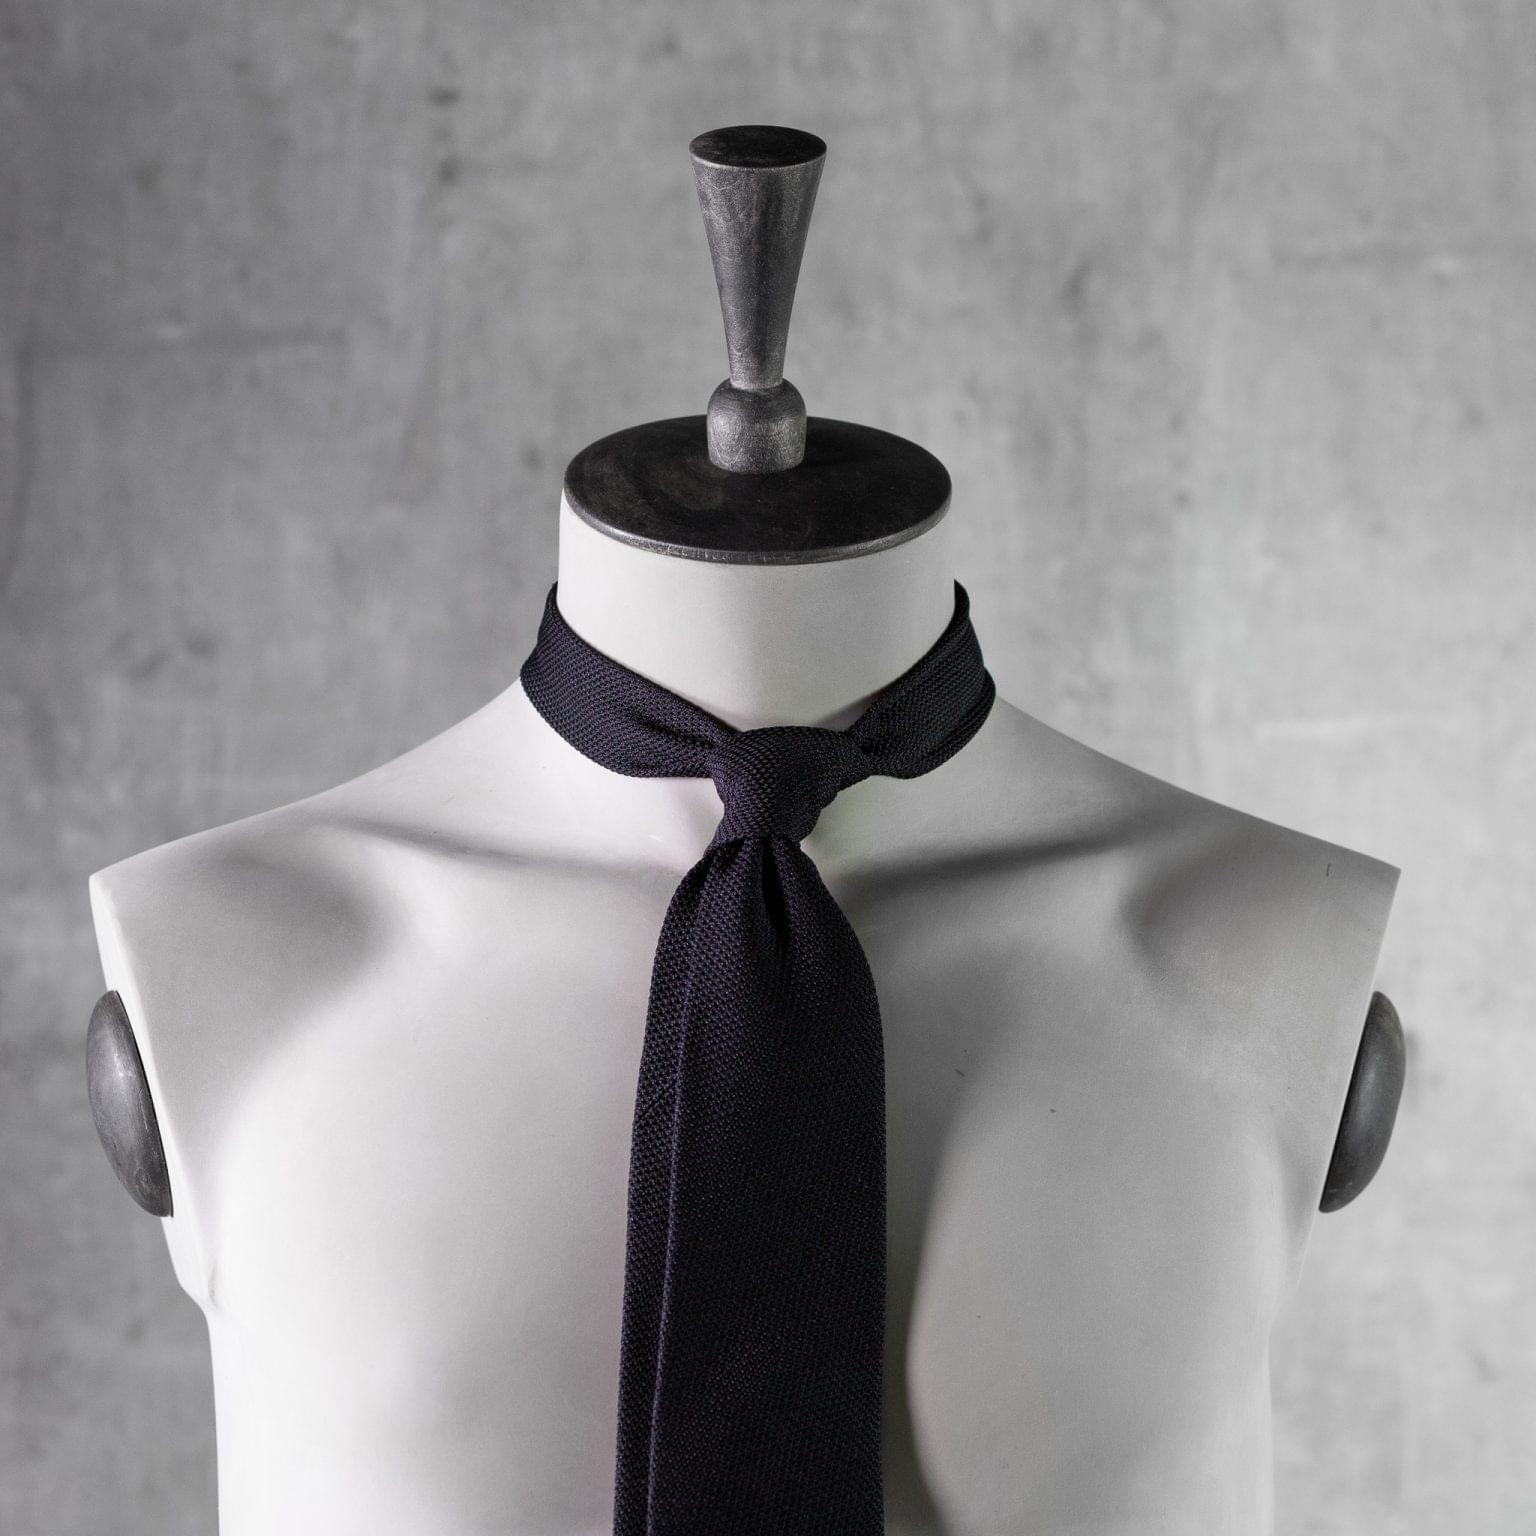 GRENADINE-0276-Tie-Initials-Corbata-Iniciales-The-Seelk-3